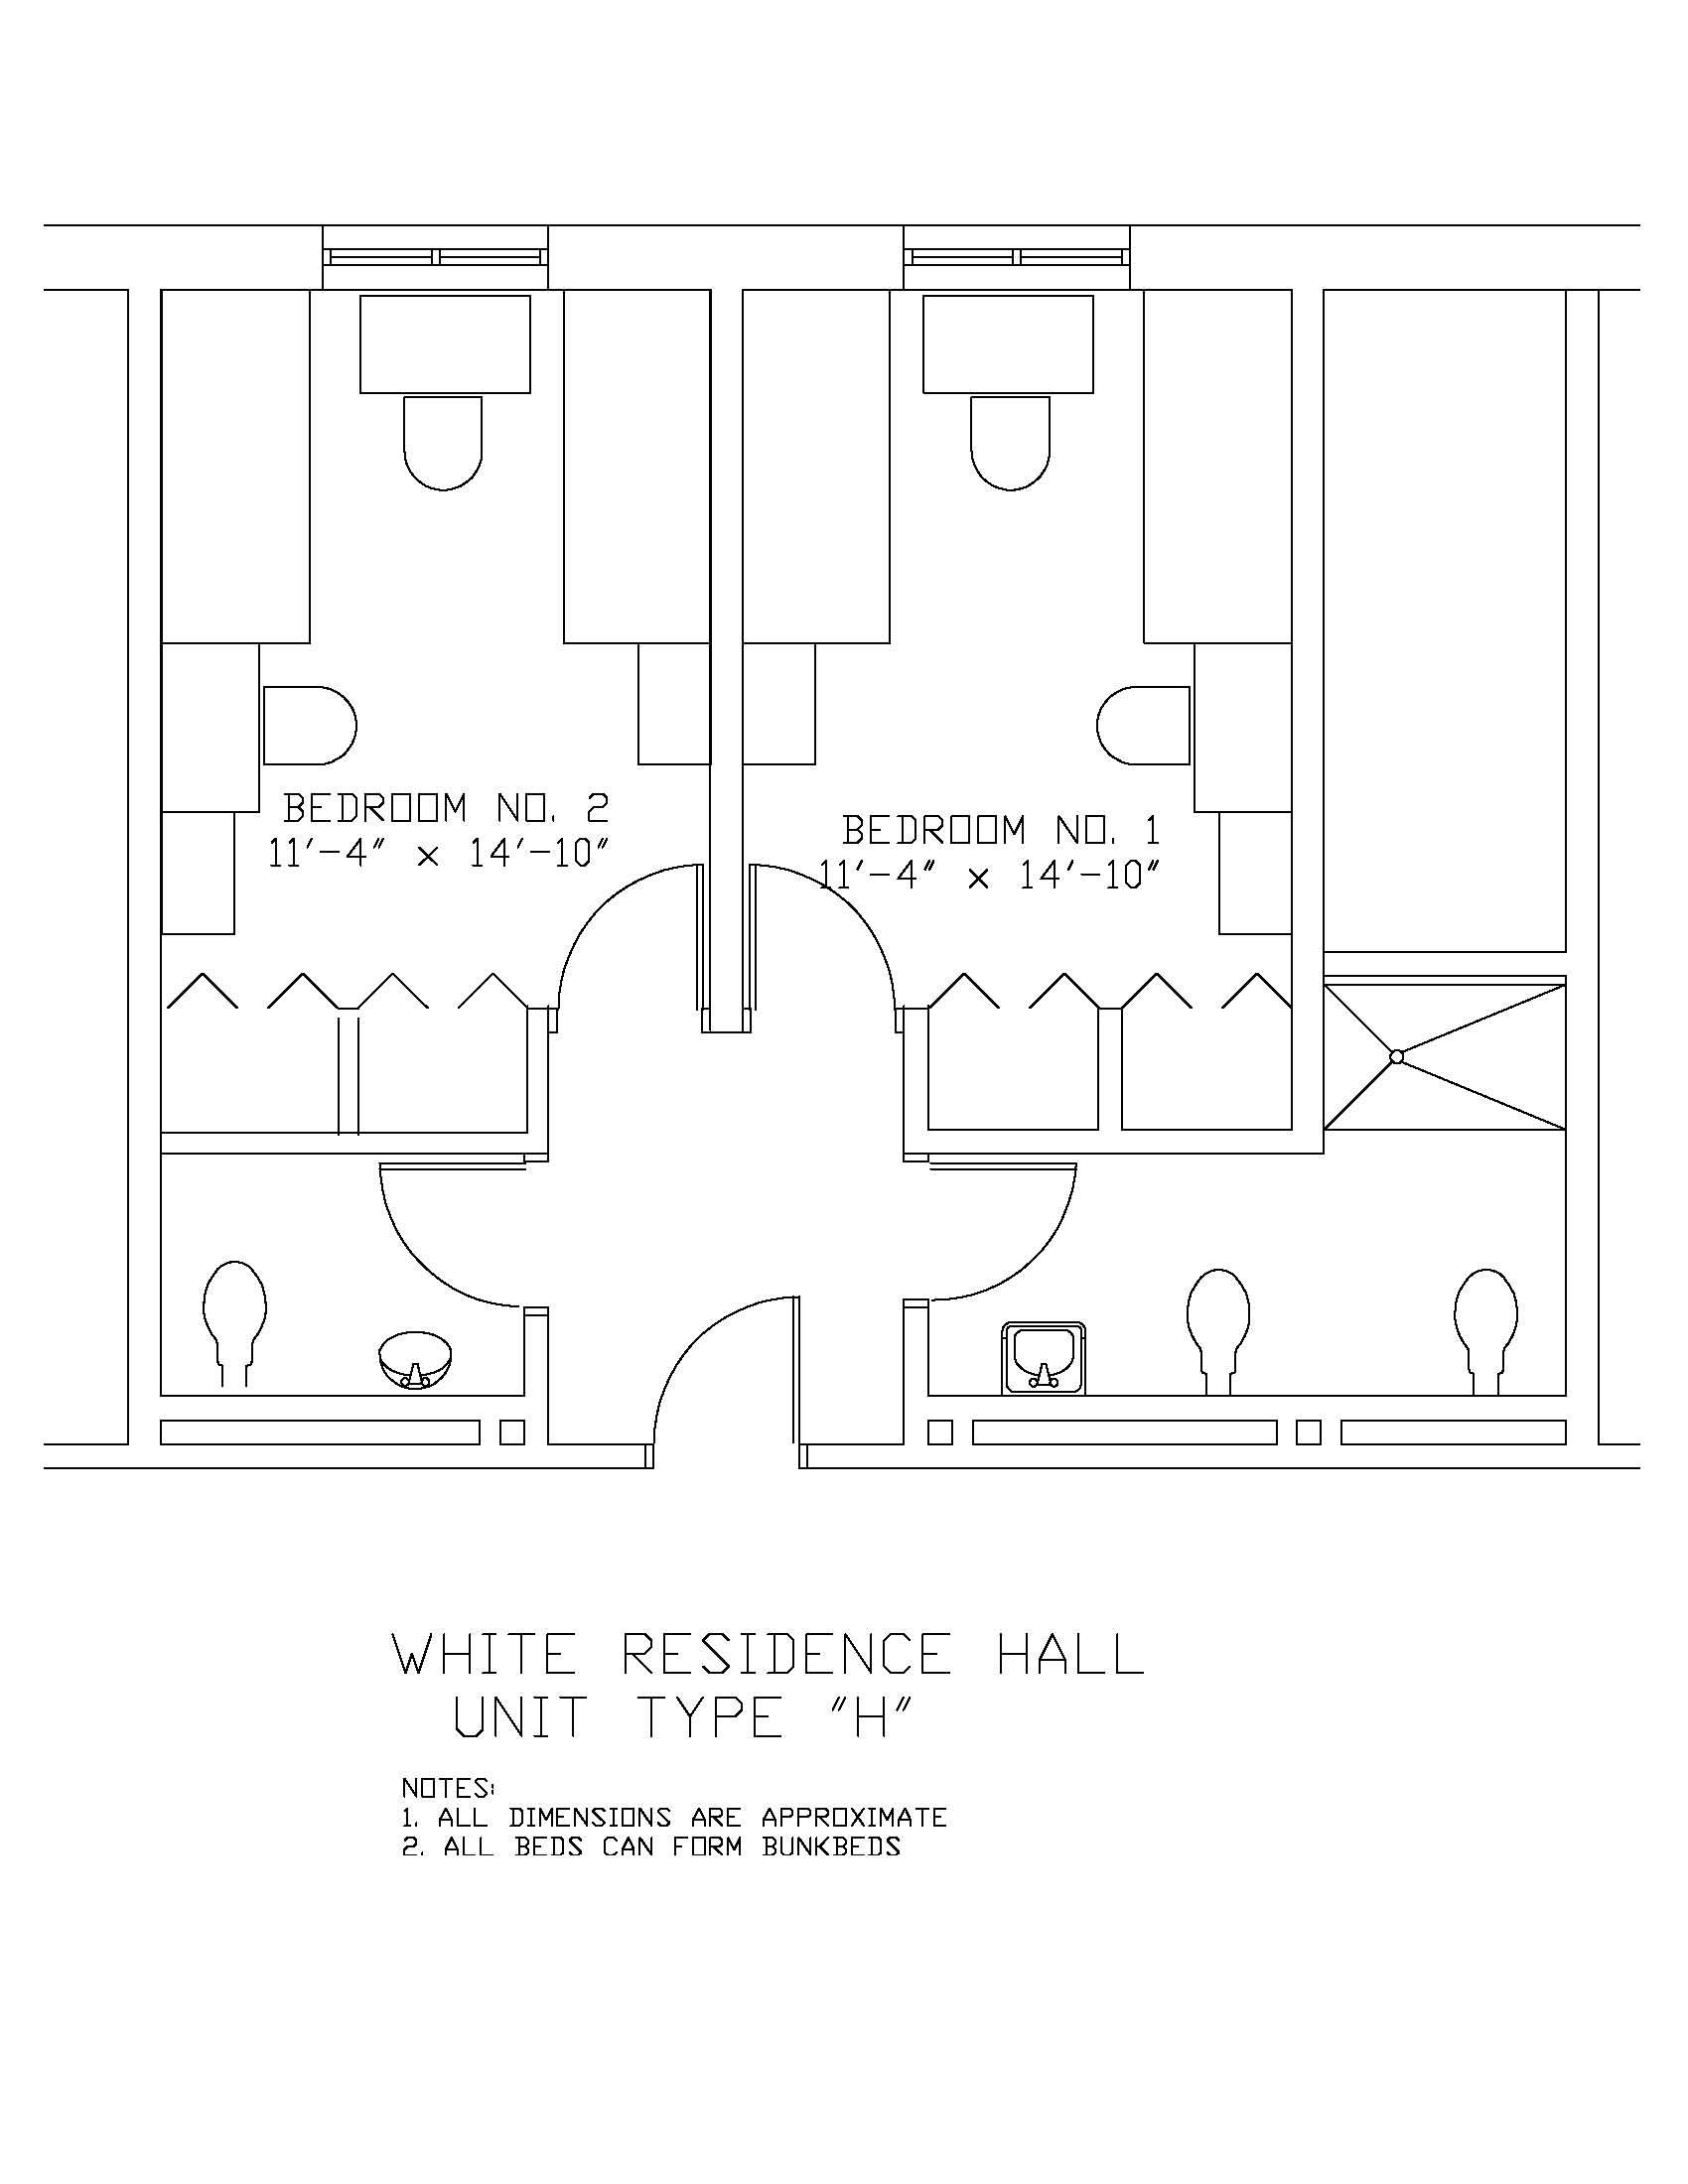 James S. White Hall: Type H